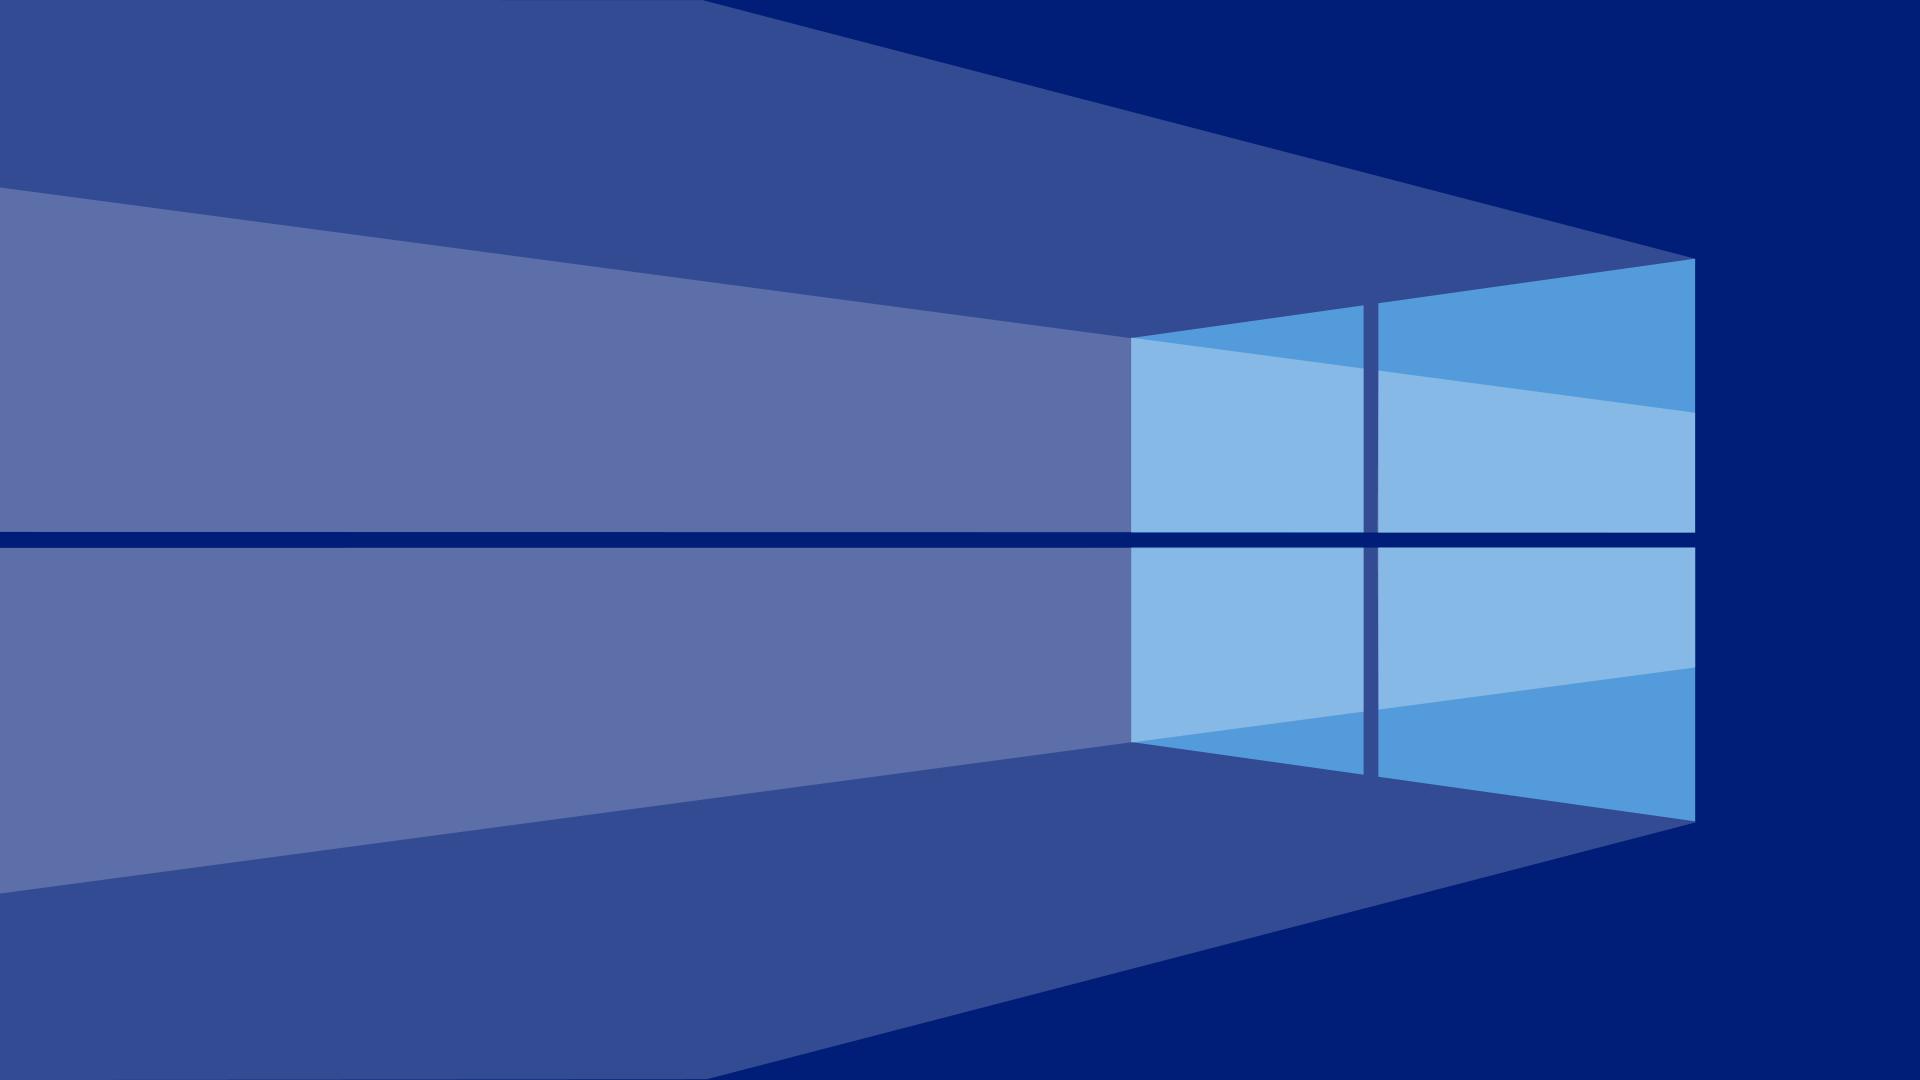 Windows 10 4k Ultra HD Papel De Parede And Planos De Fundo